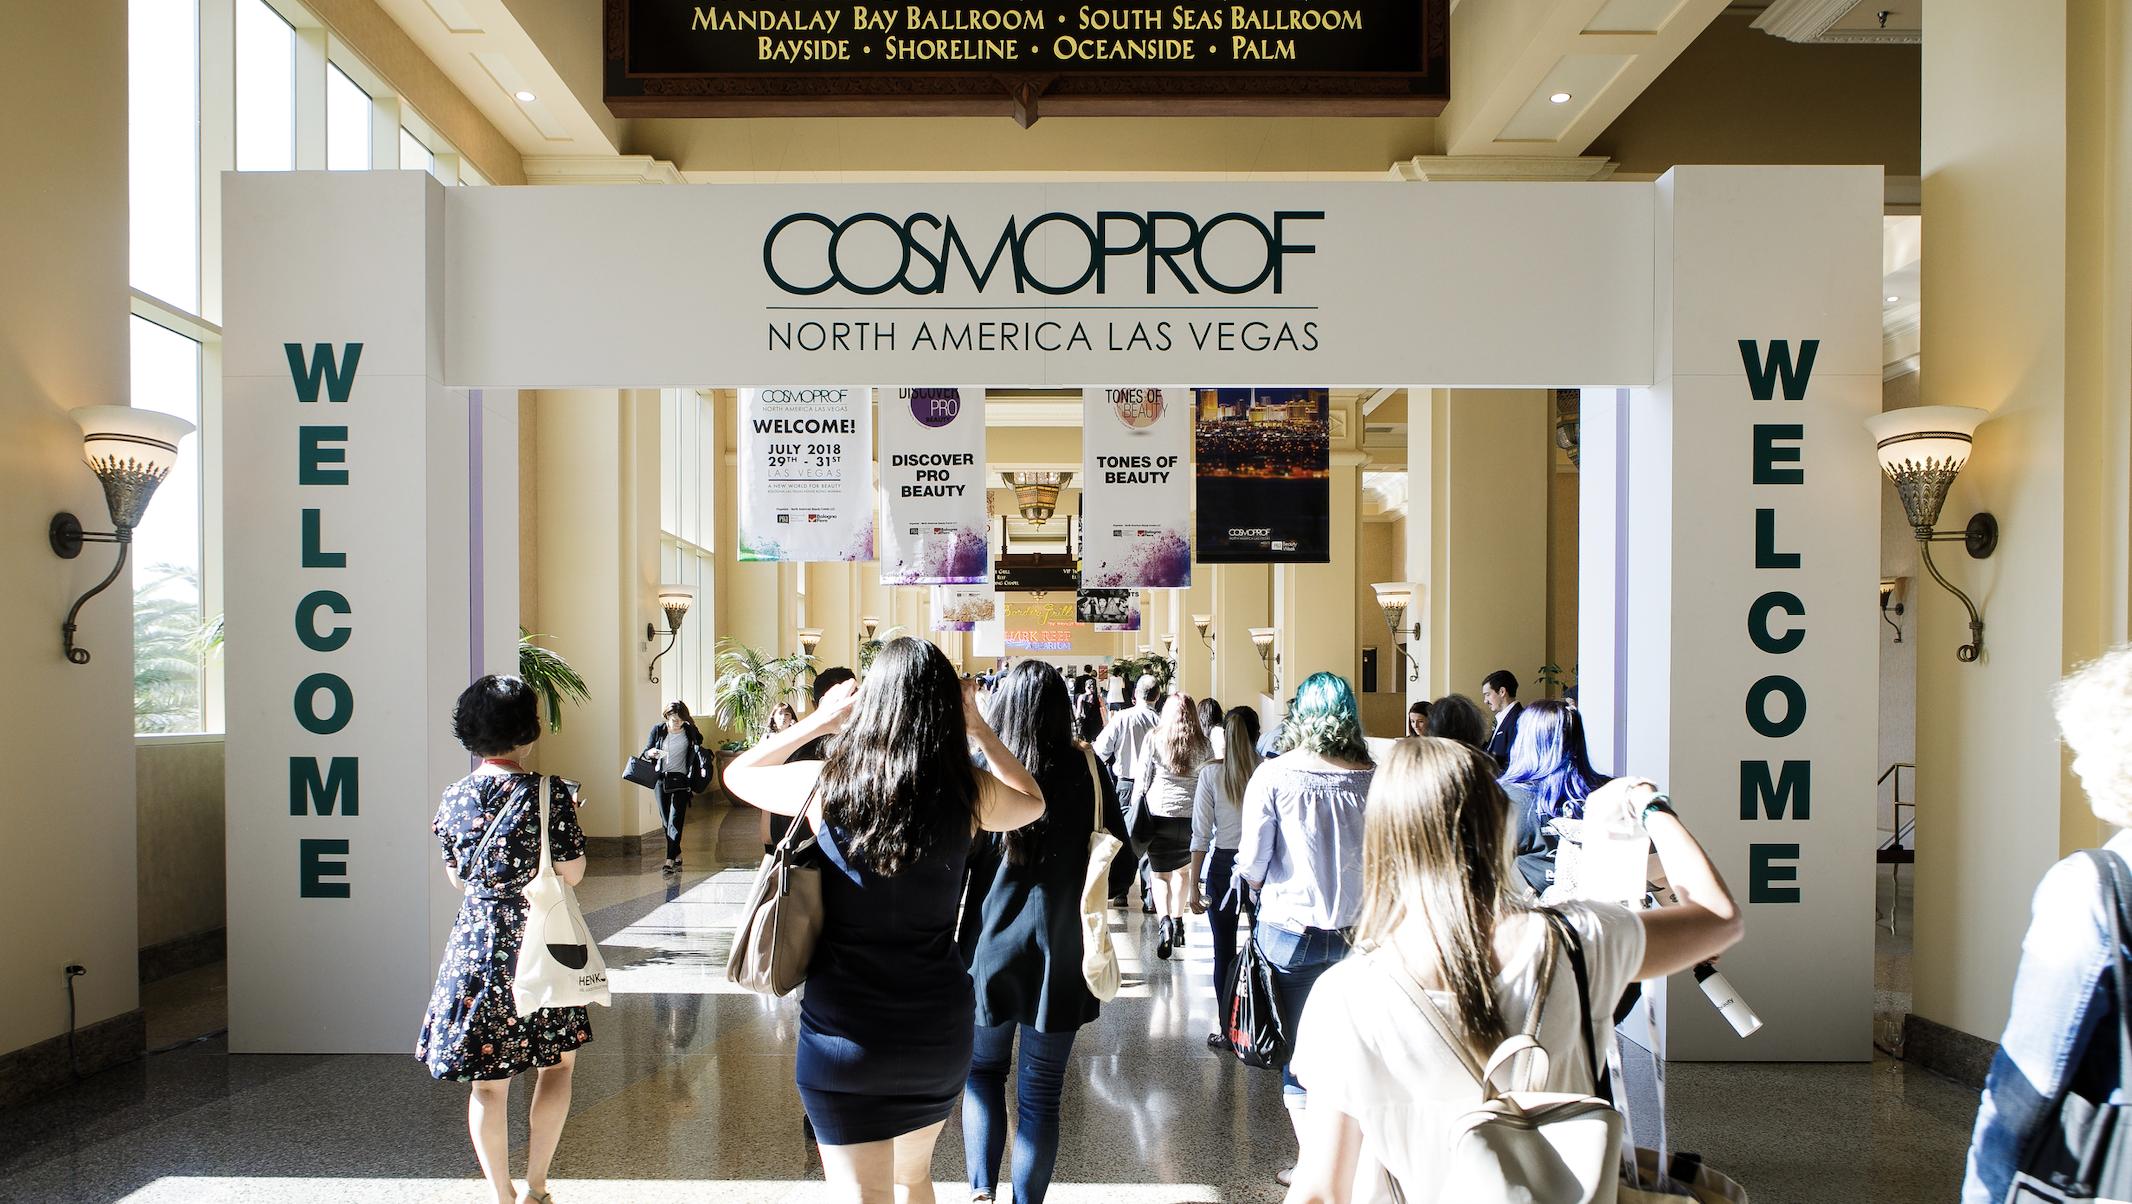 Cosmoprof Las Vegas